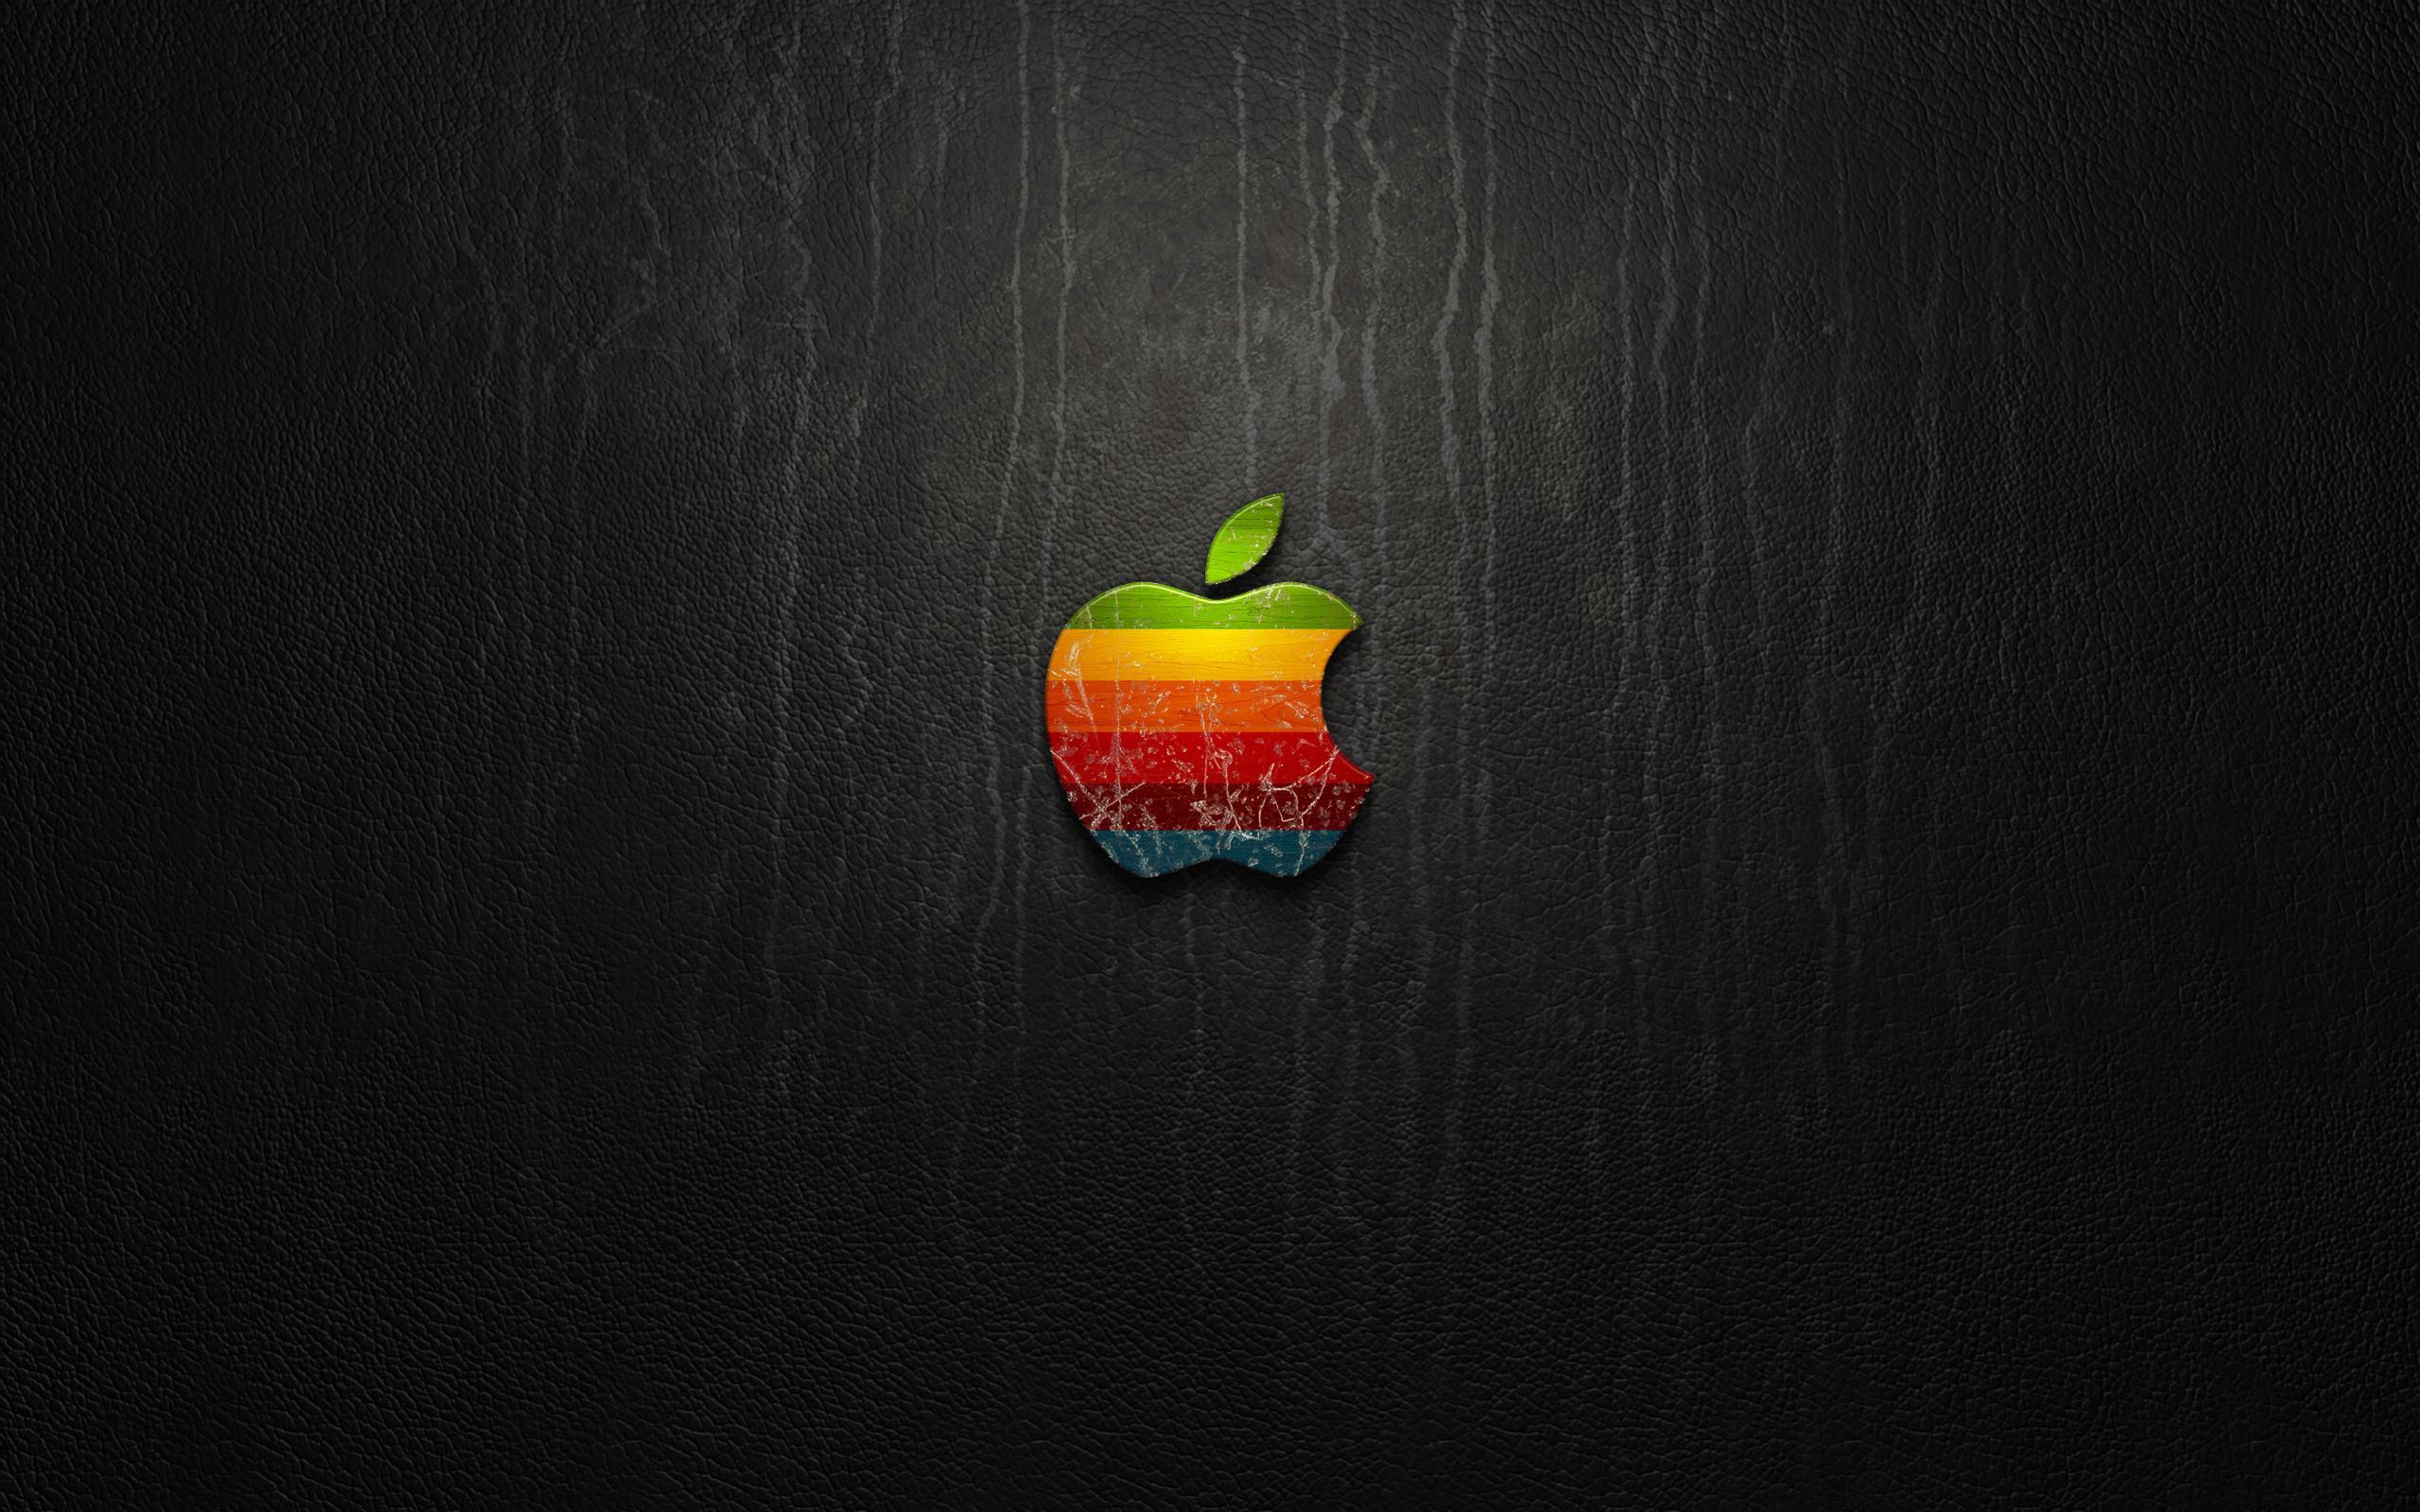 apple logo leather wallpaper [2560x1600]